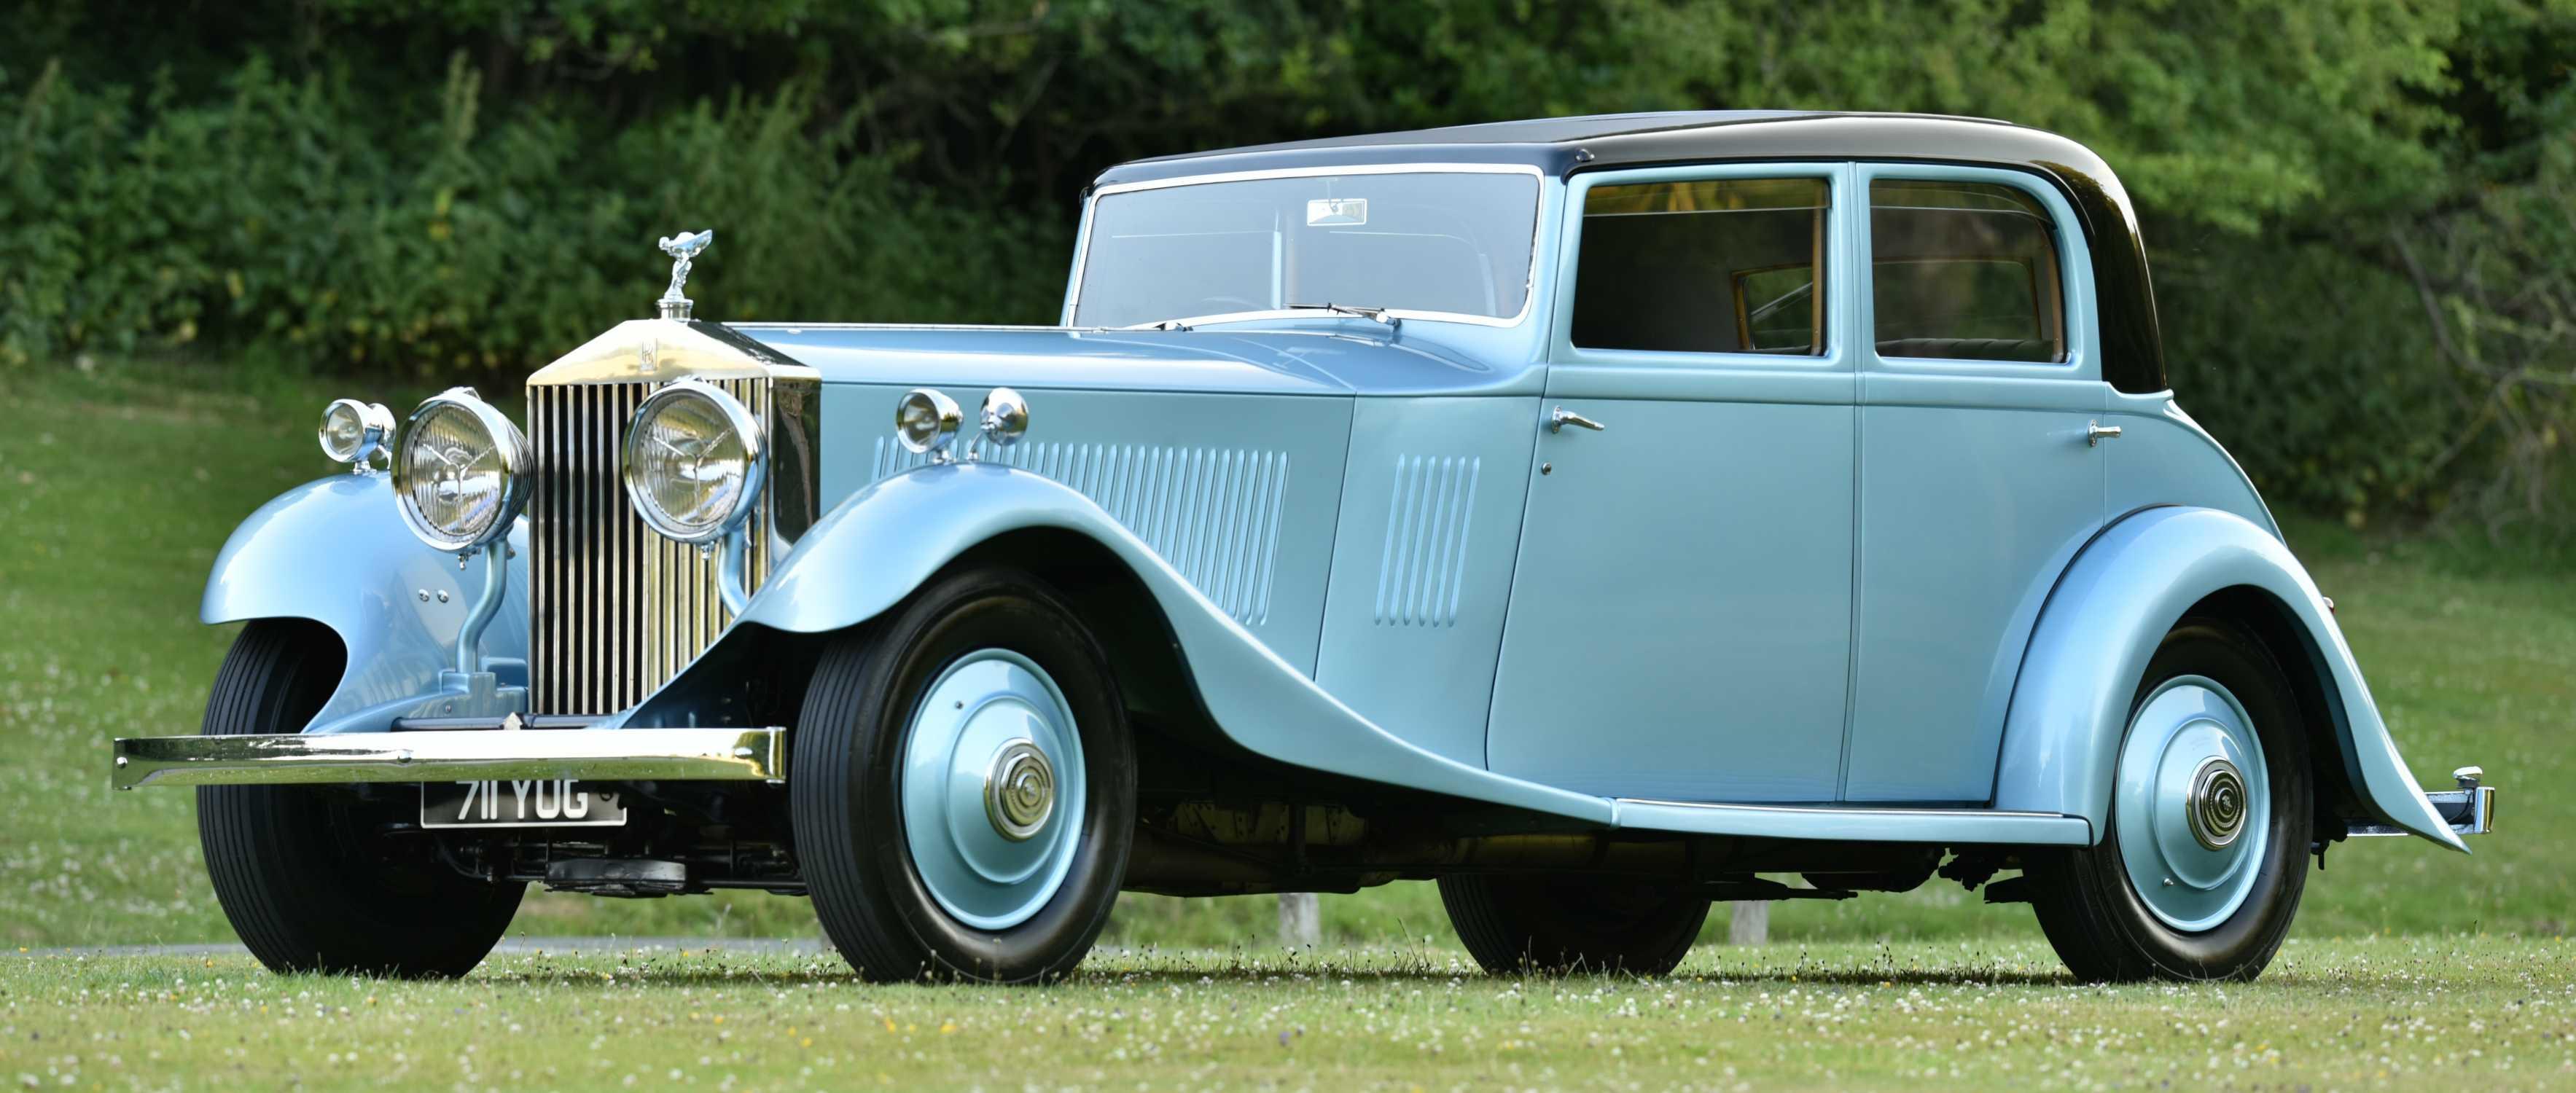 1933 ROLLS-ROYCE PHANTOM II FRONT 3/4